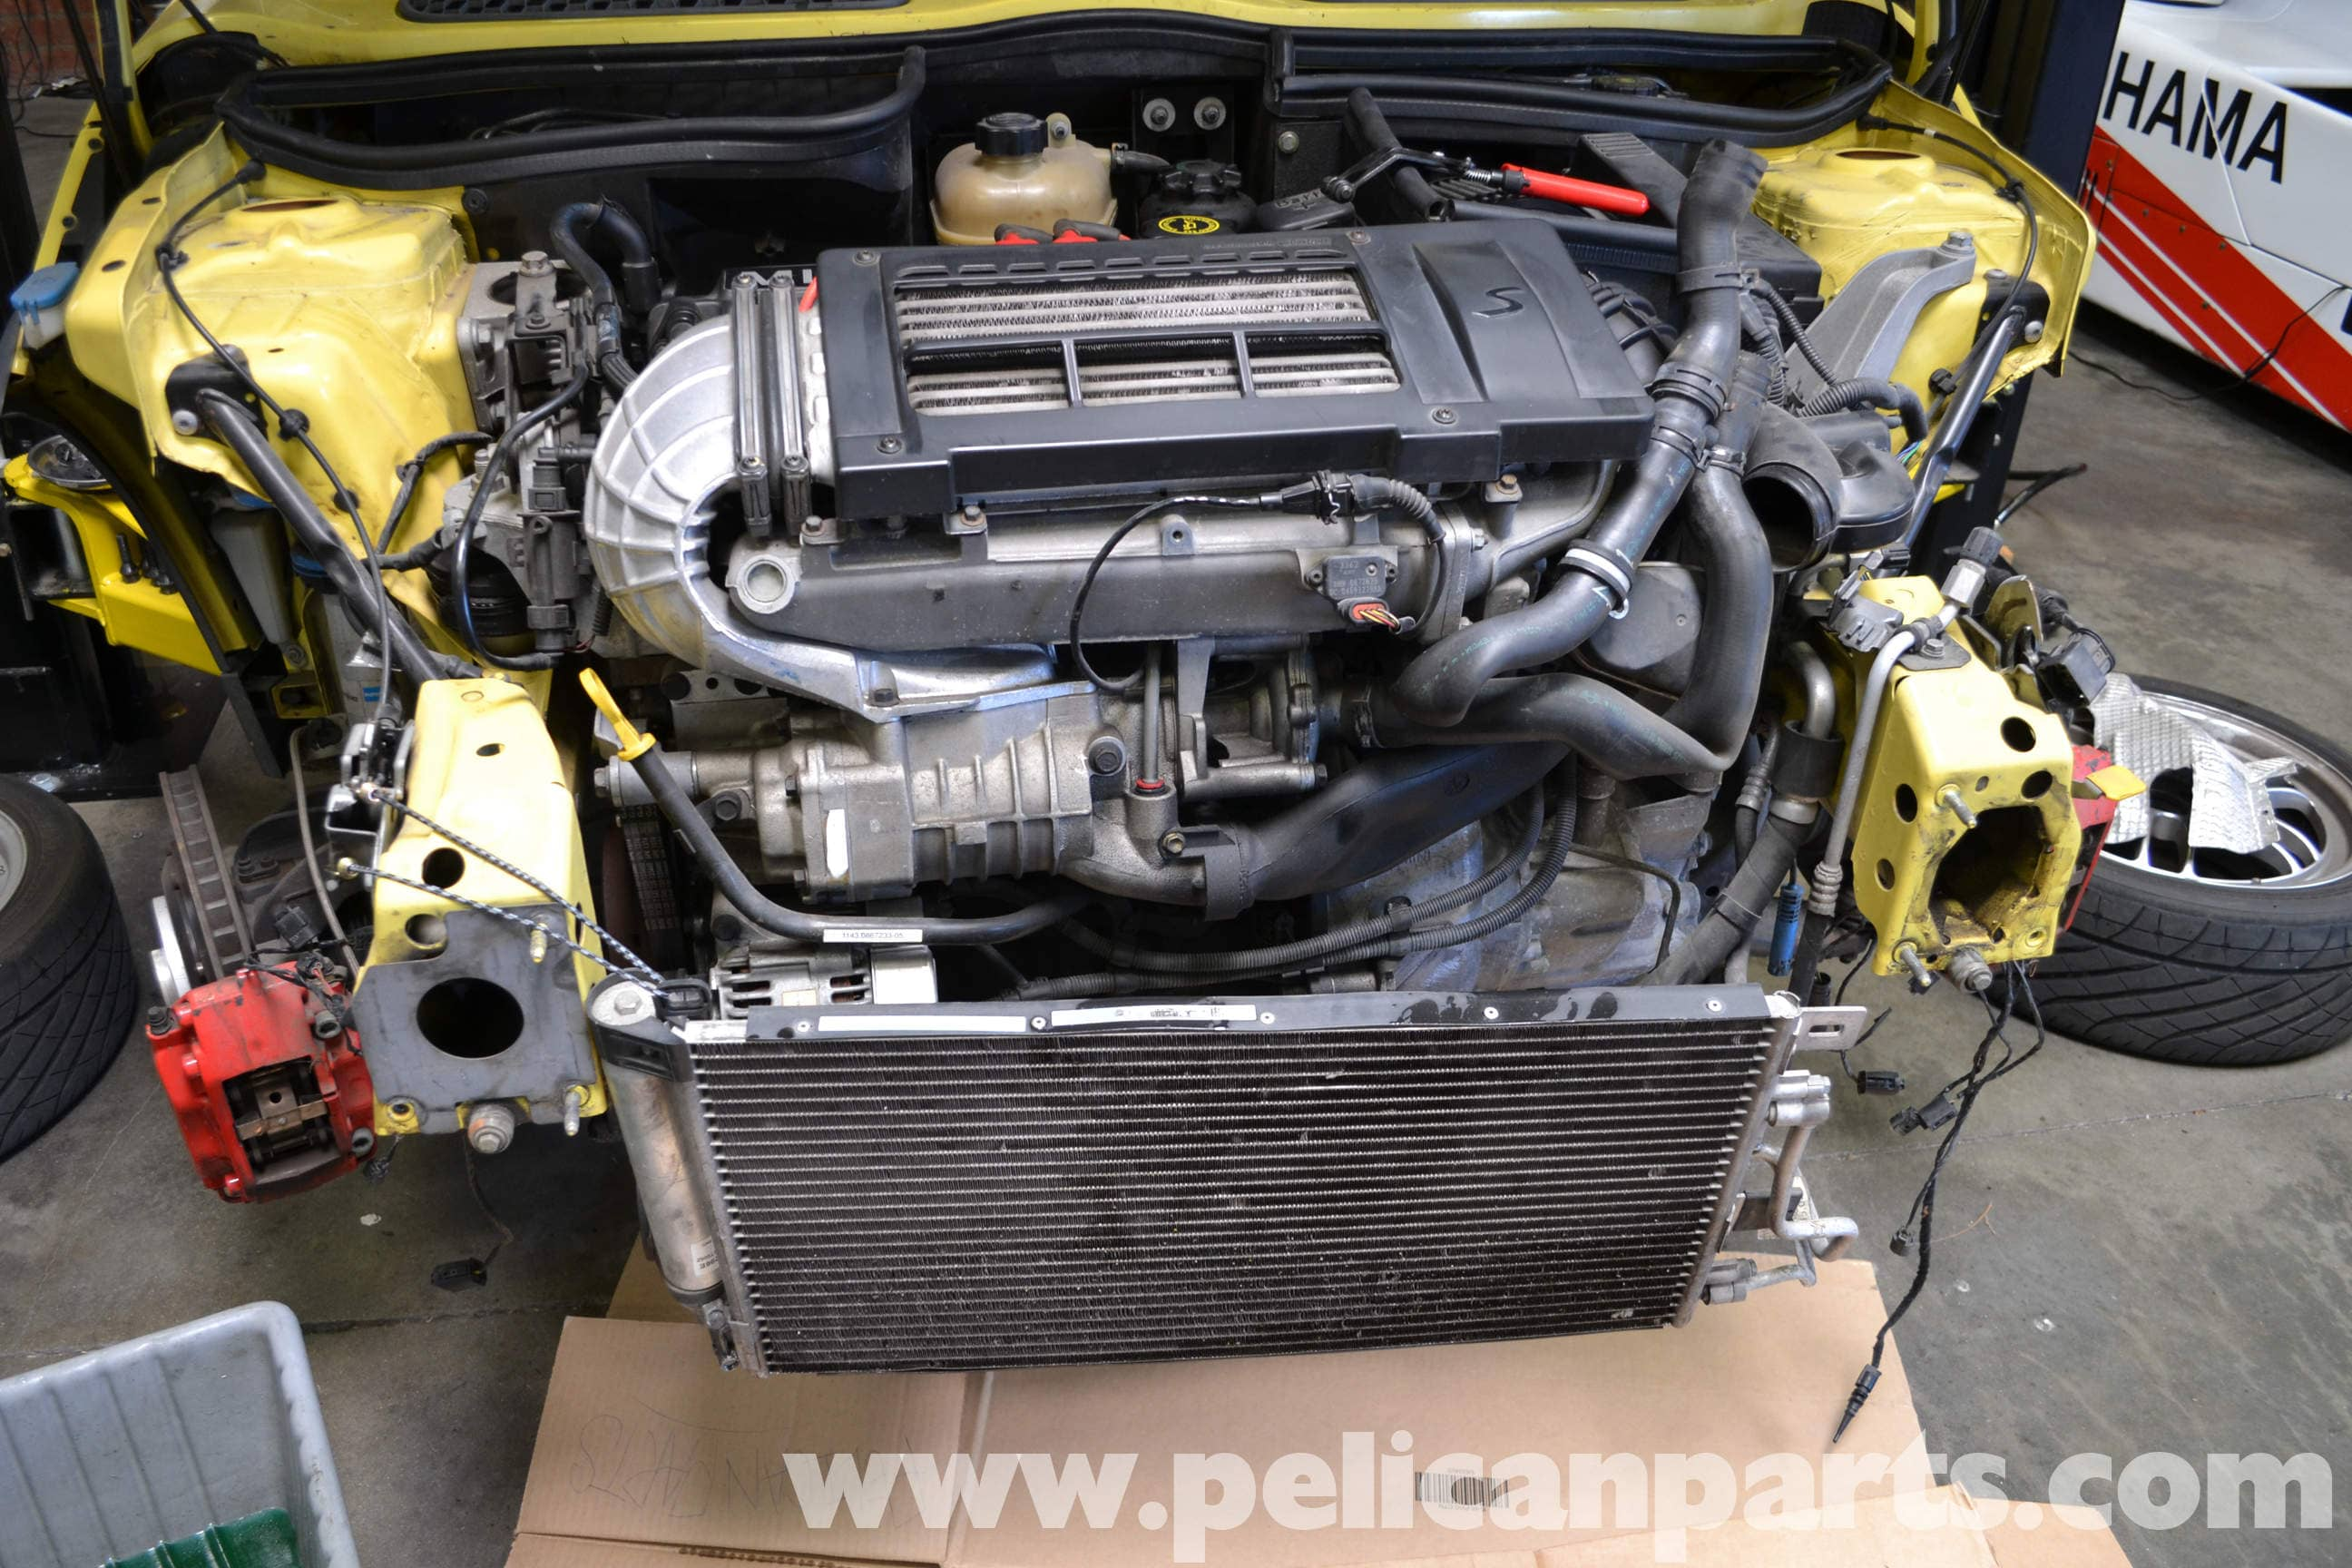 Mini R53 Supercharger Replacement R53 Cooper 2002 2006 Pelican Parts Diy Maintenance Article